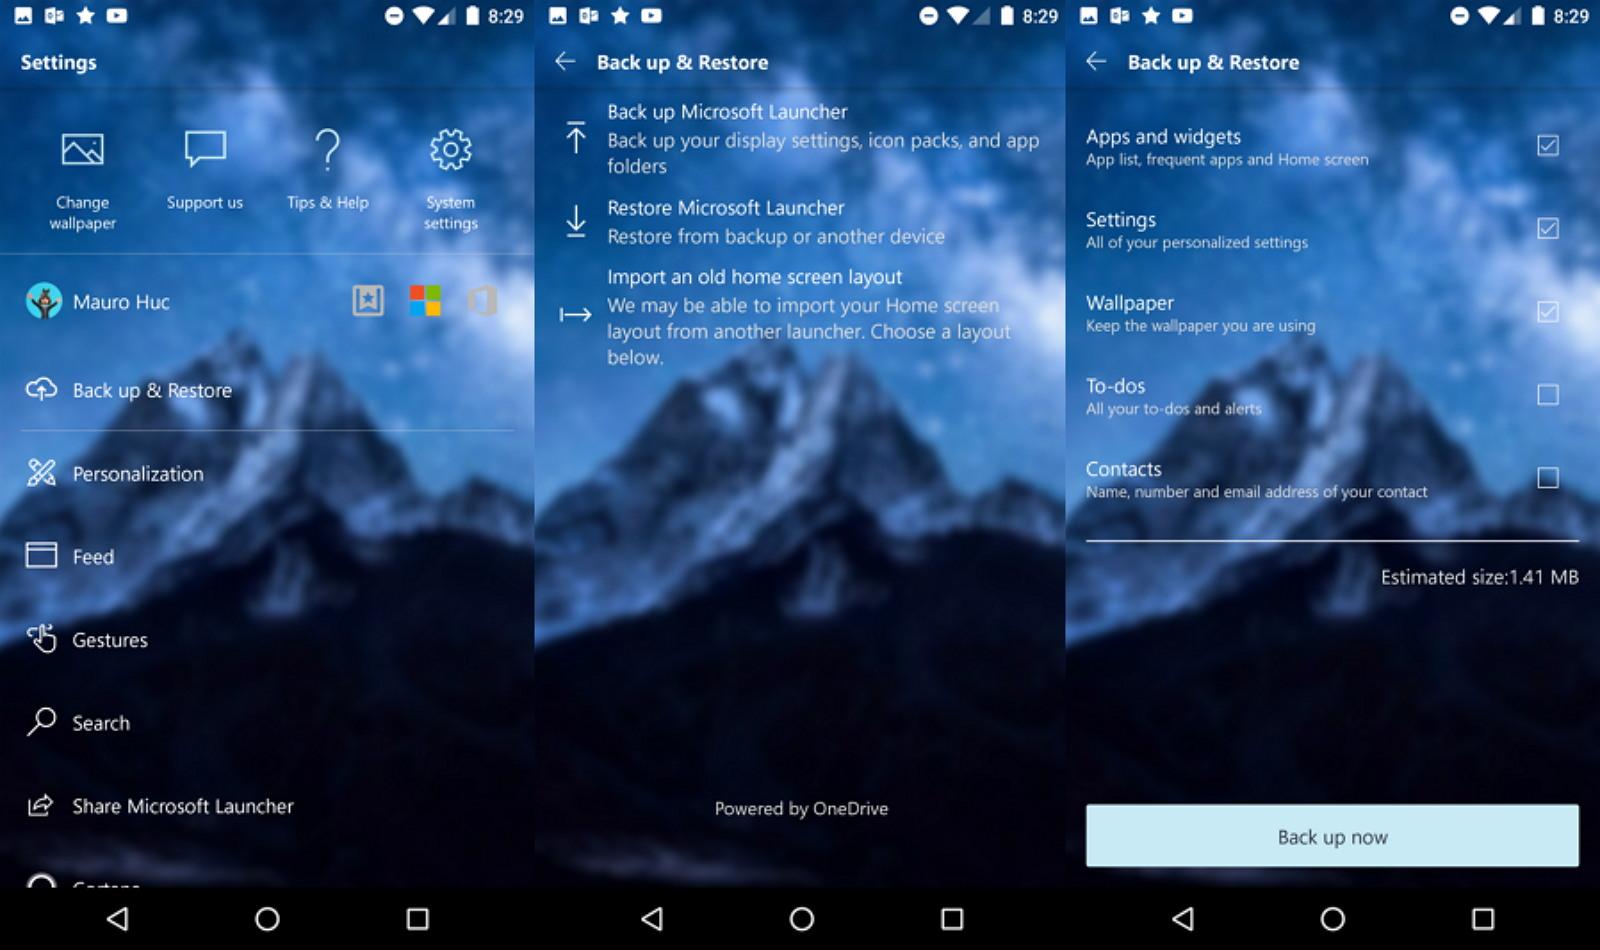 Microsoft Launcher settings backup